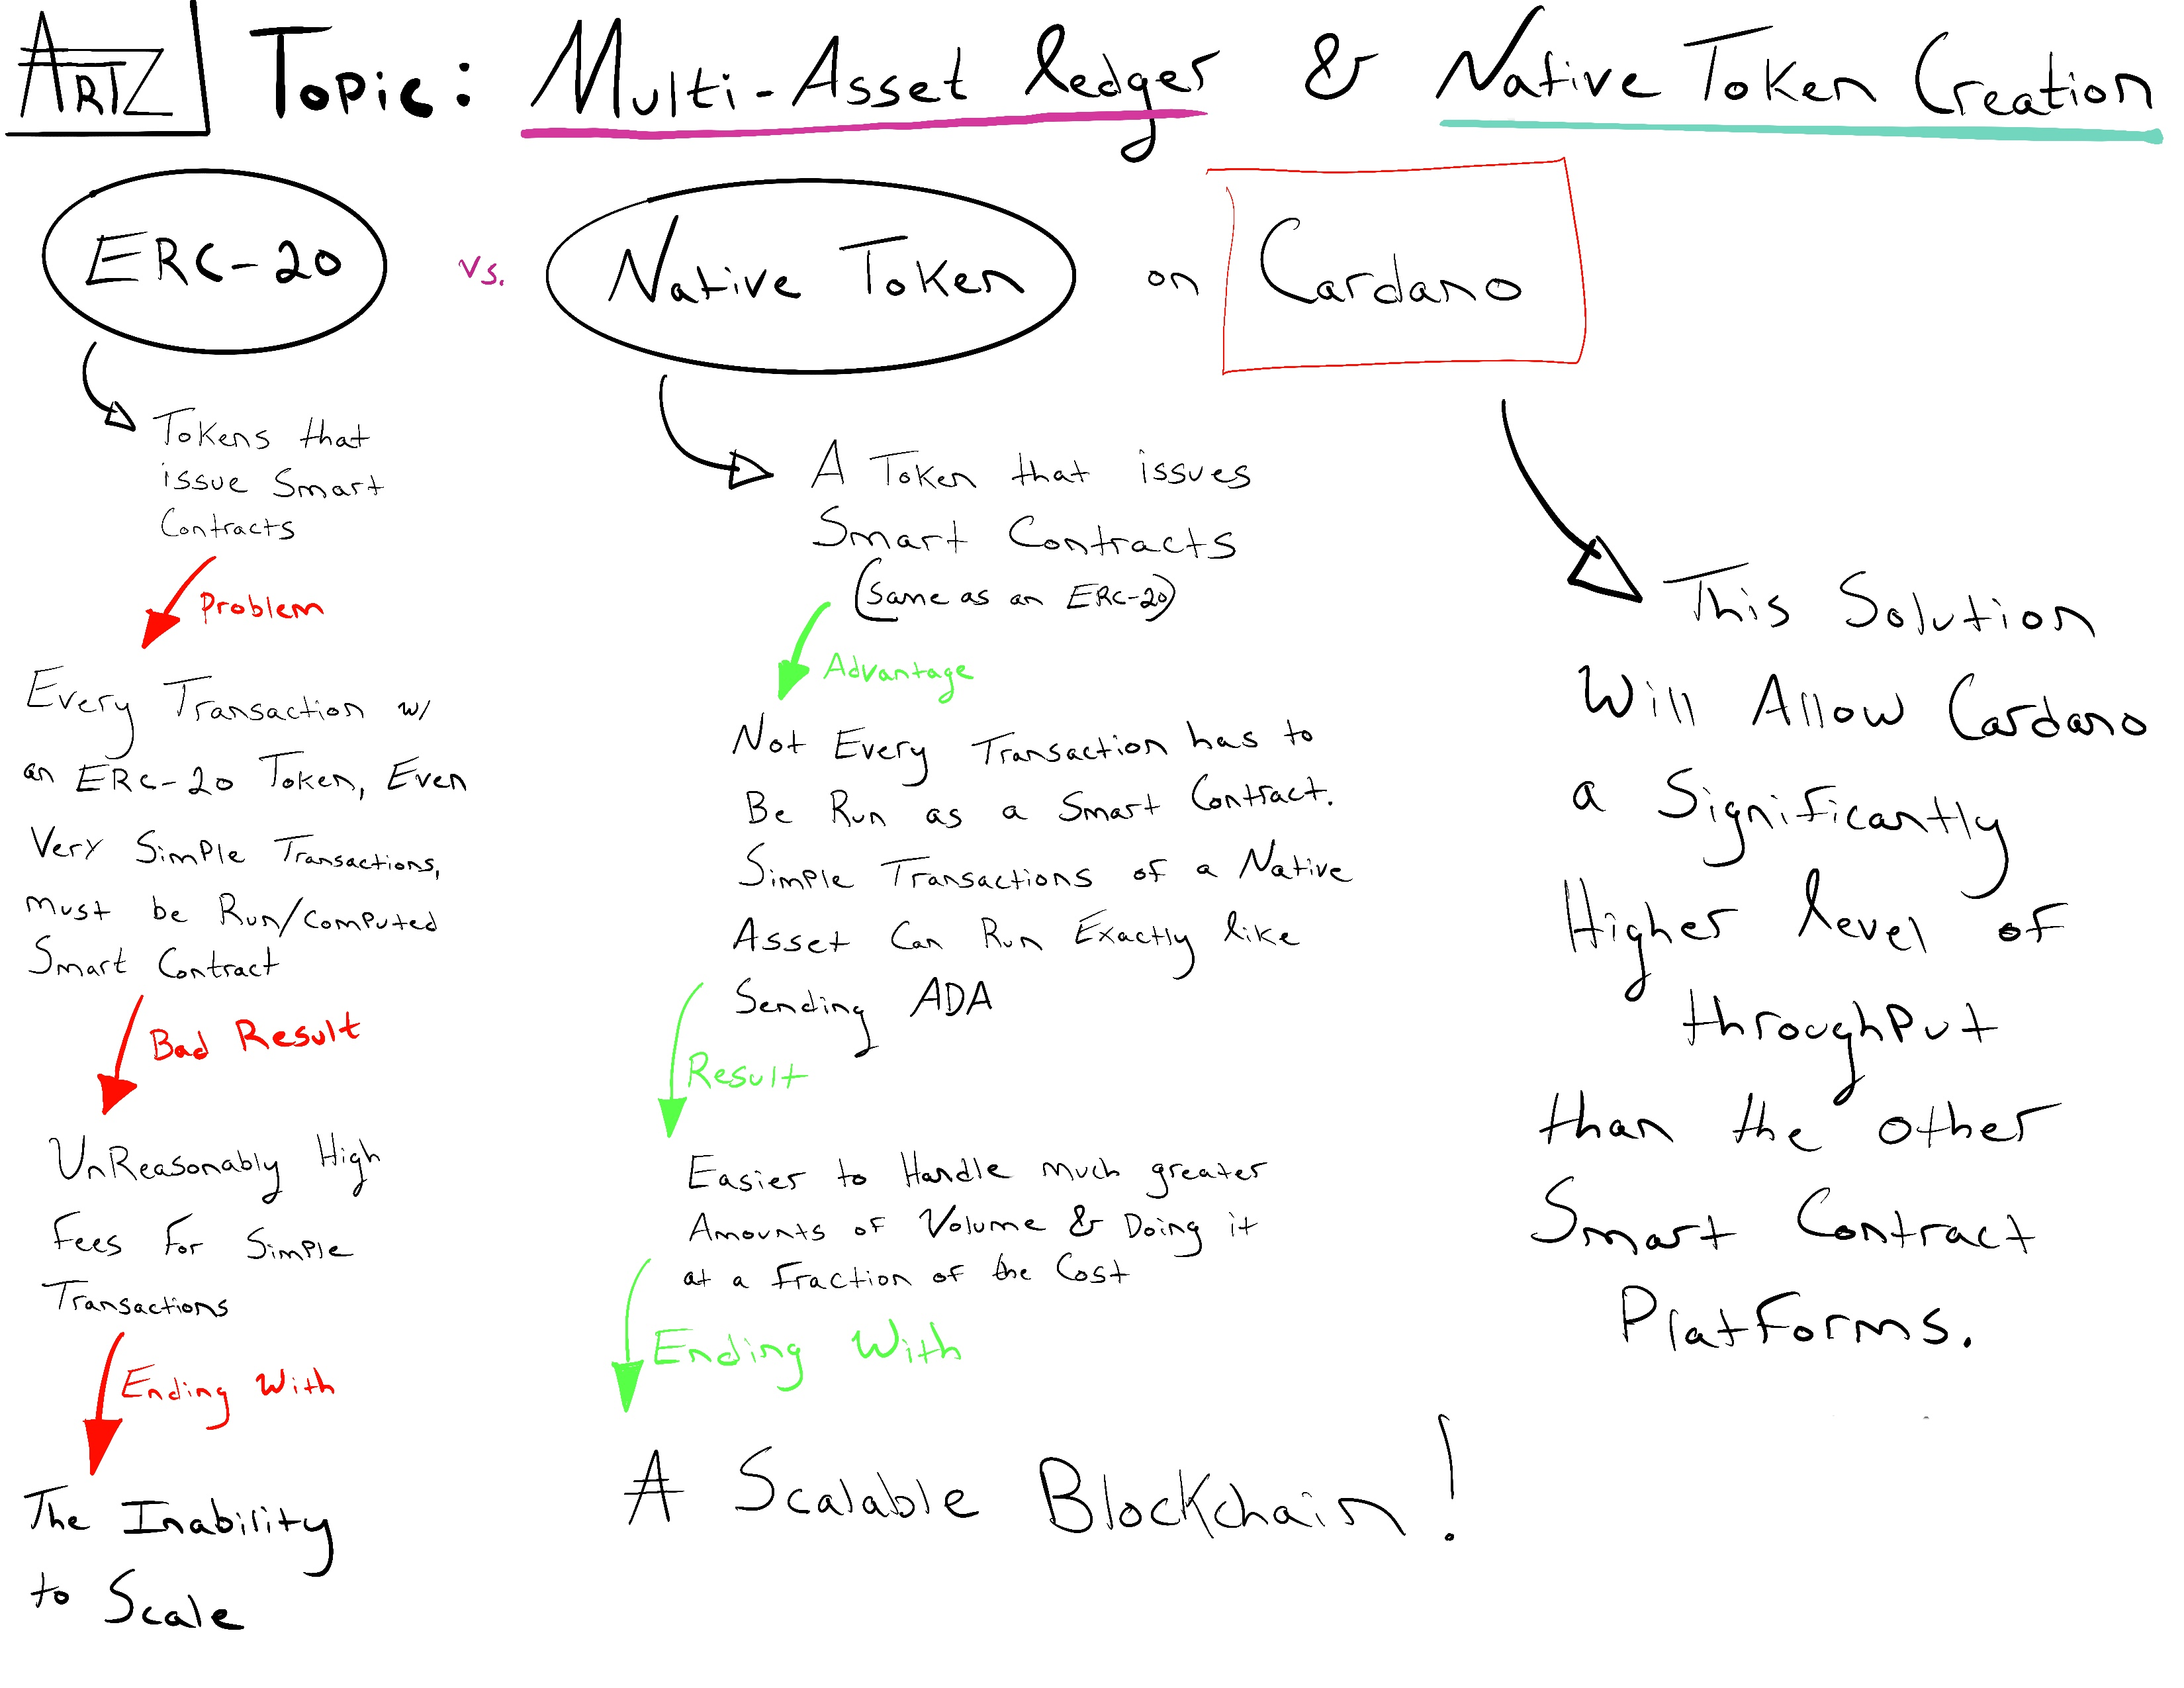 ERC-20 vs. Native Assets